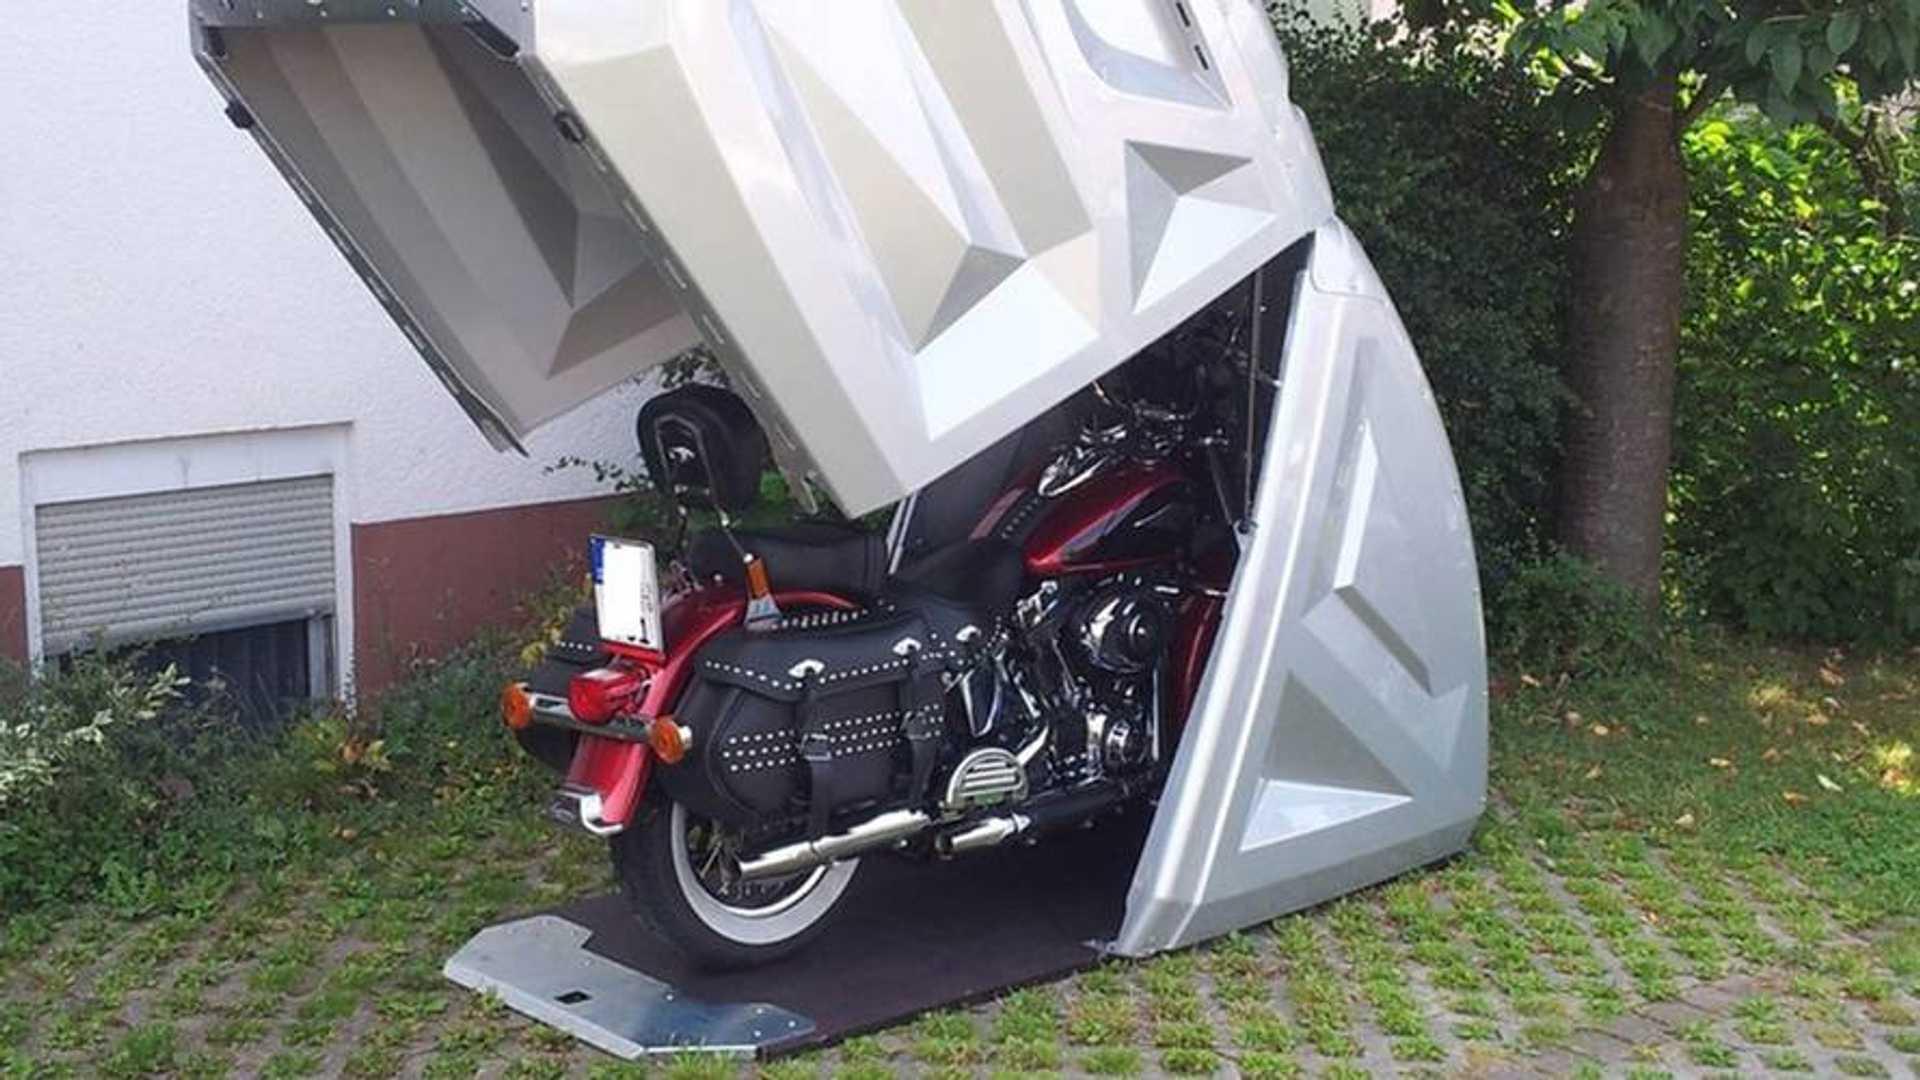 Meet BikeBOX24: A Versatile, Semi-Portable Bike Garage